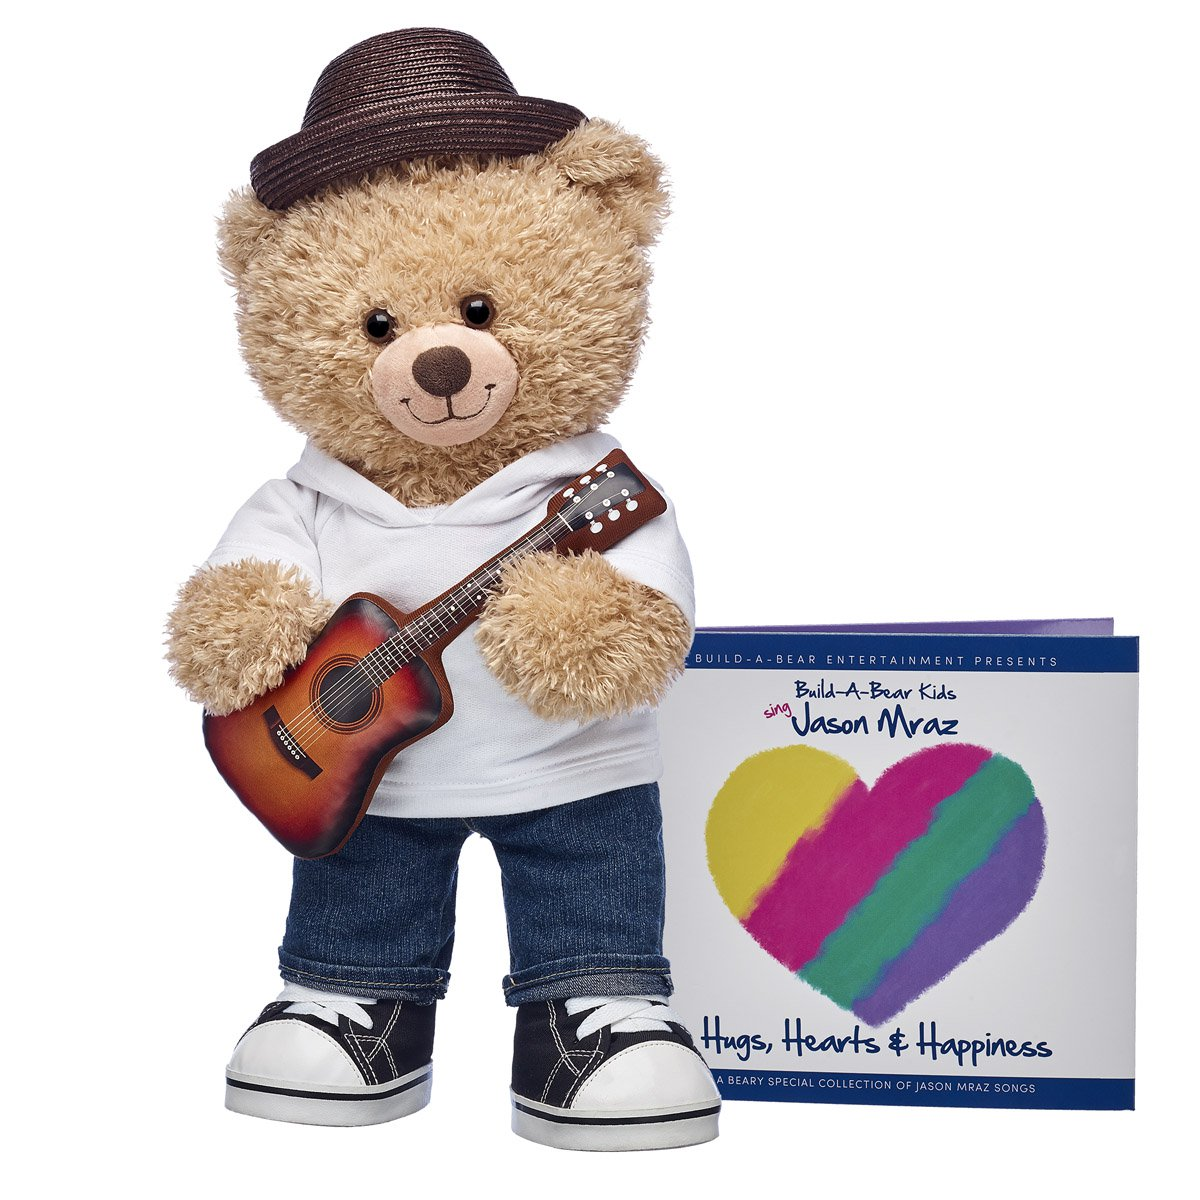 Teddy Bear Cute Cuddly Gift Present Birthday Valentine I LOVE BROOKE NEW